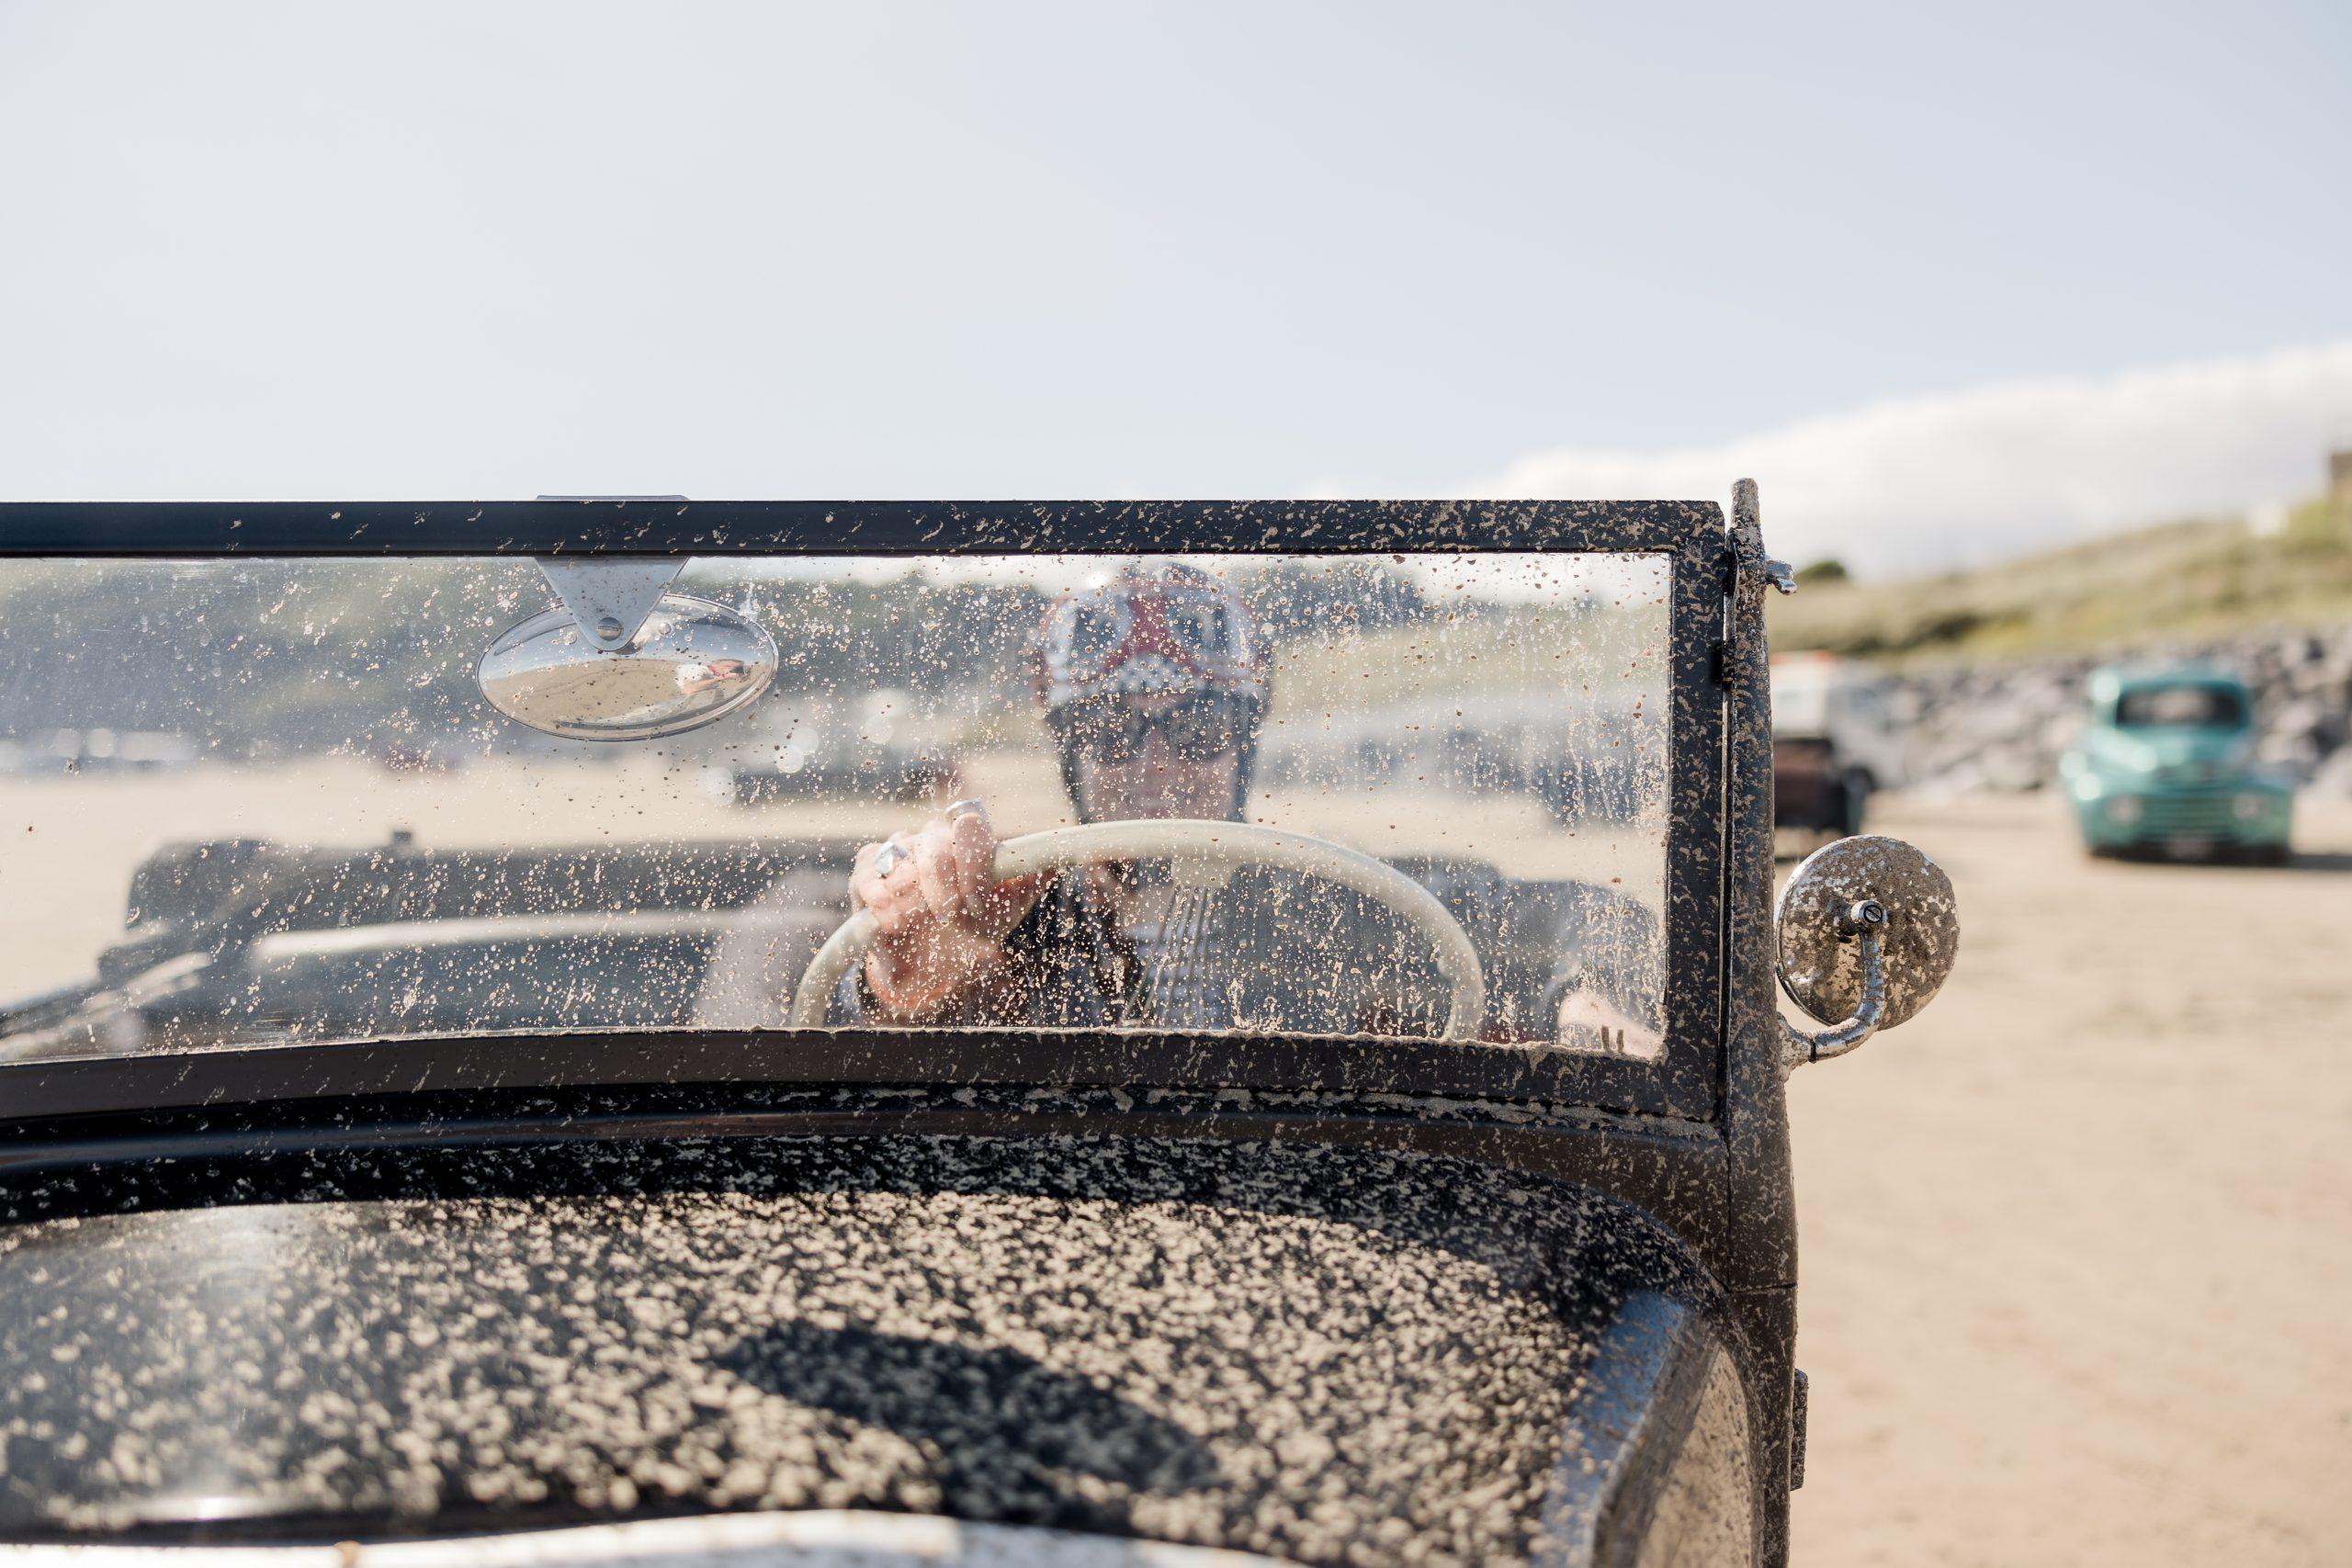 Pendine Sands hot rod racer front